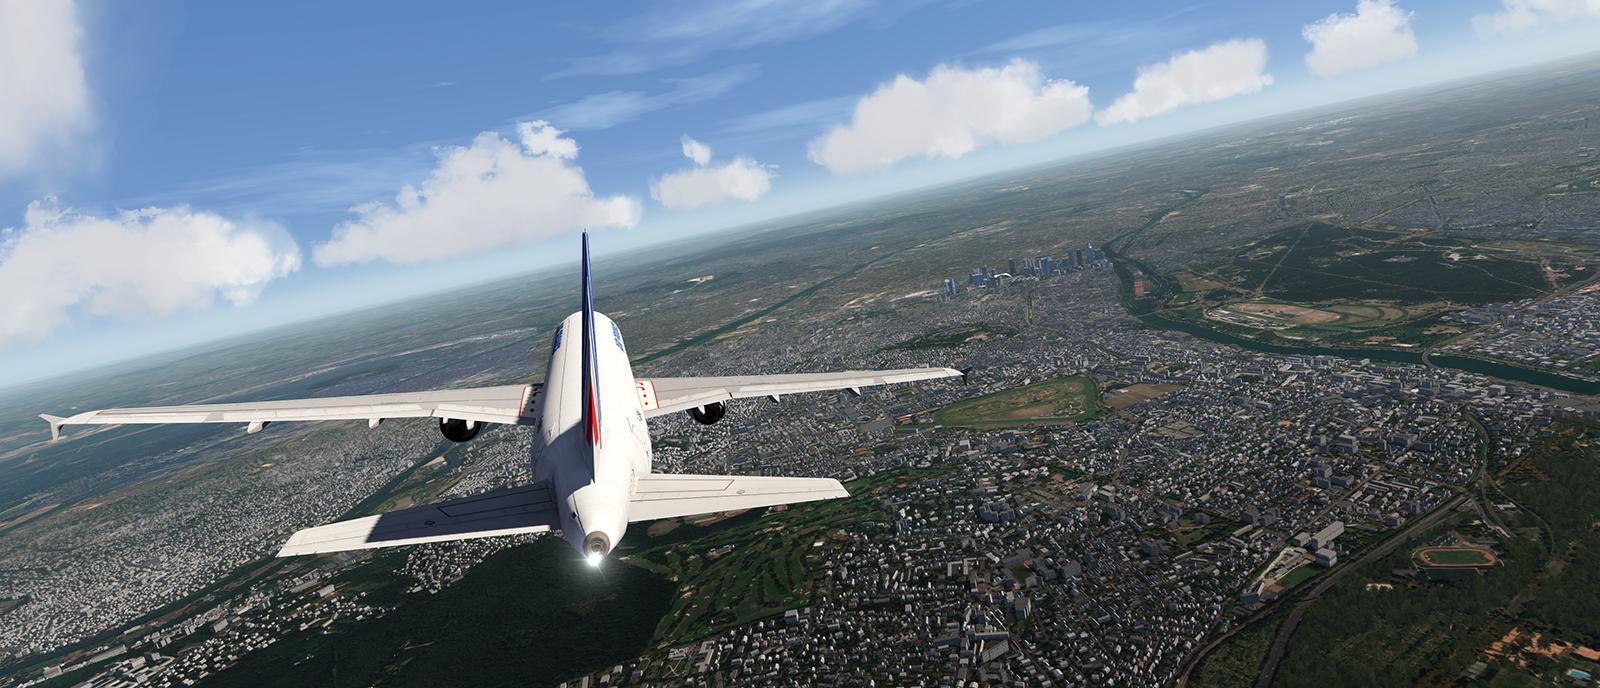 aerofly_fs_2_screenshot_07_20191005-2306